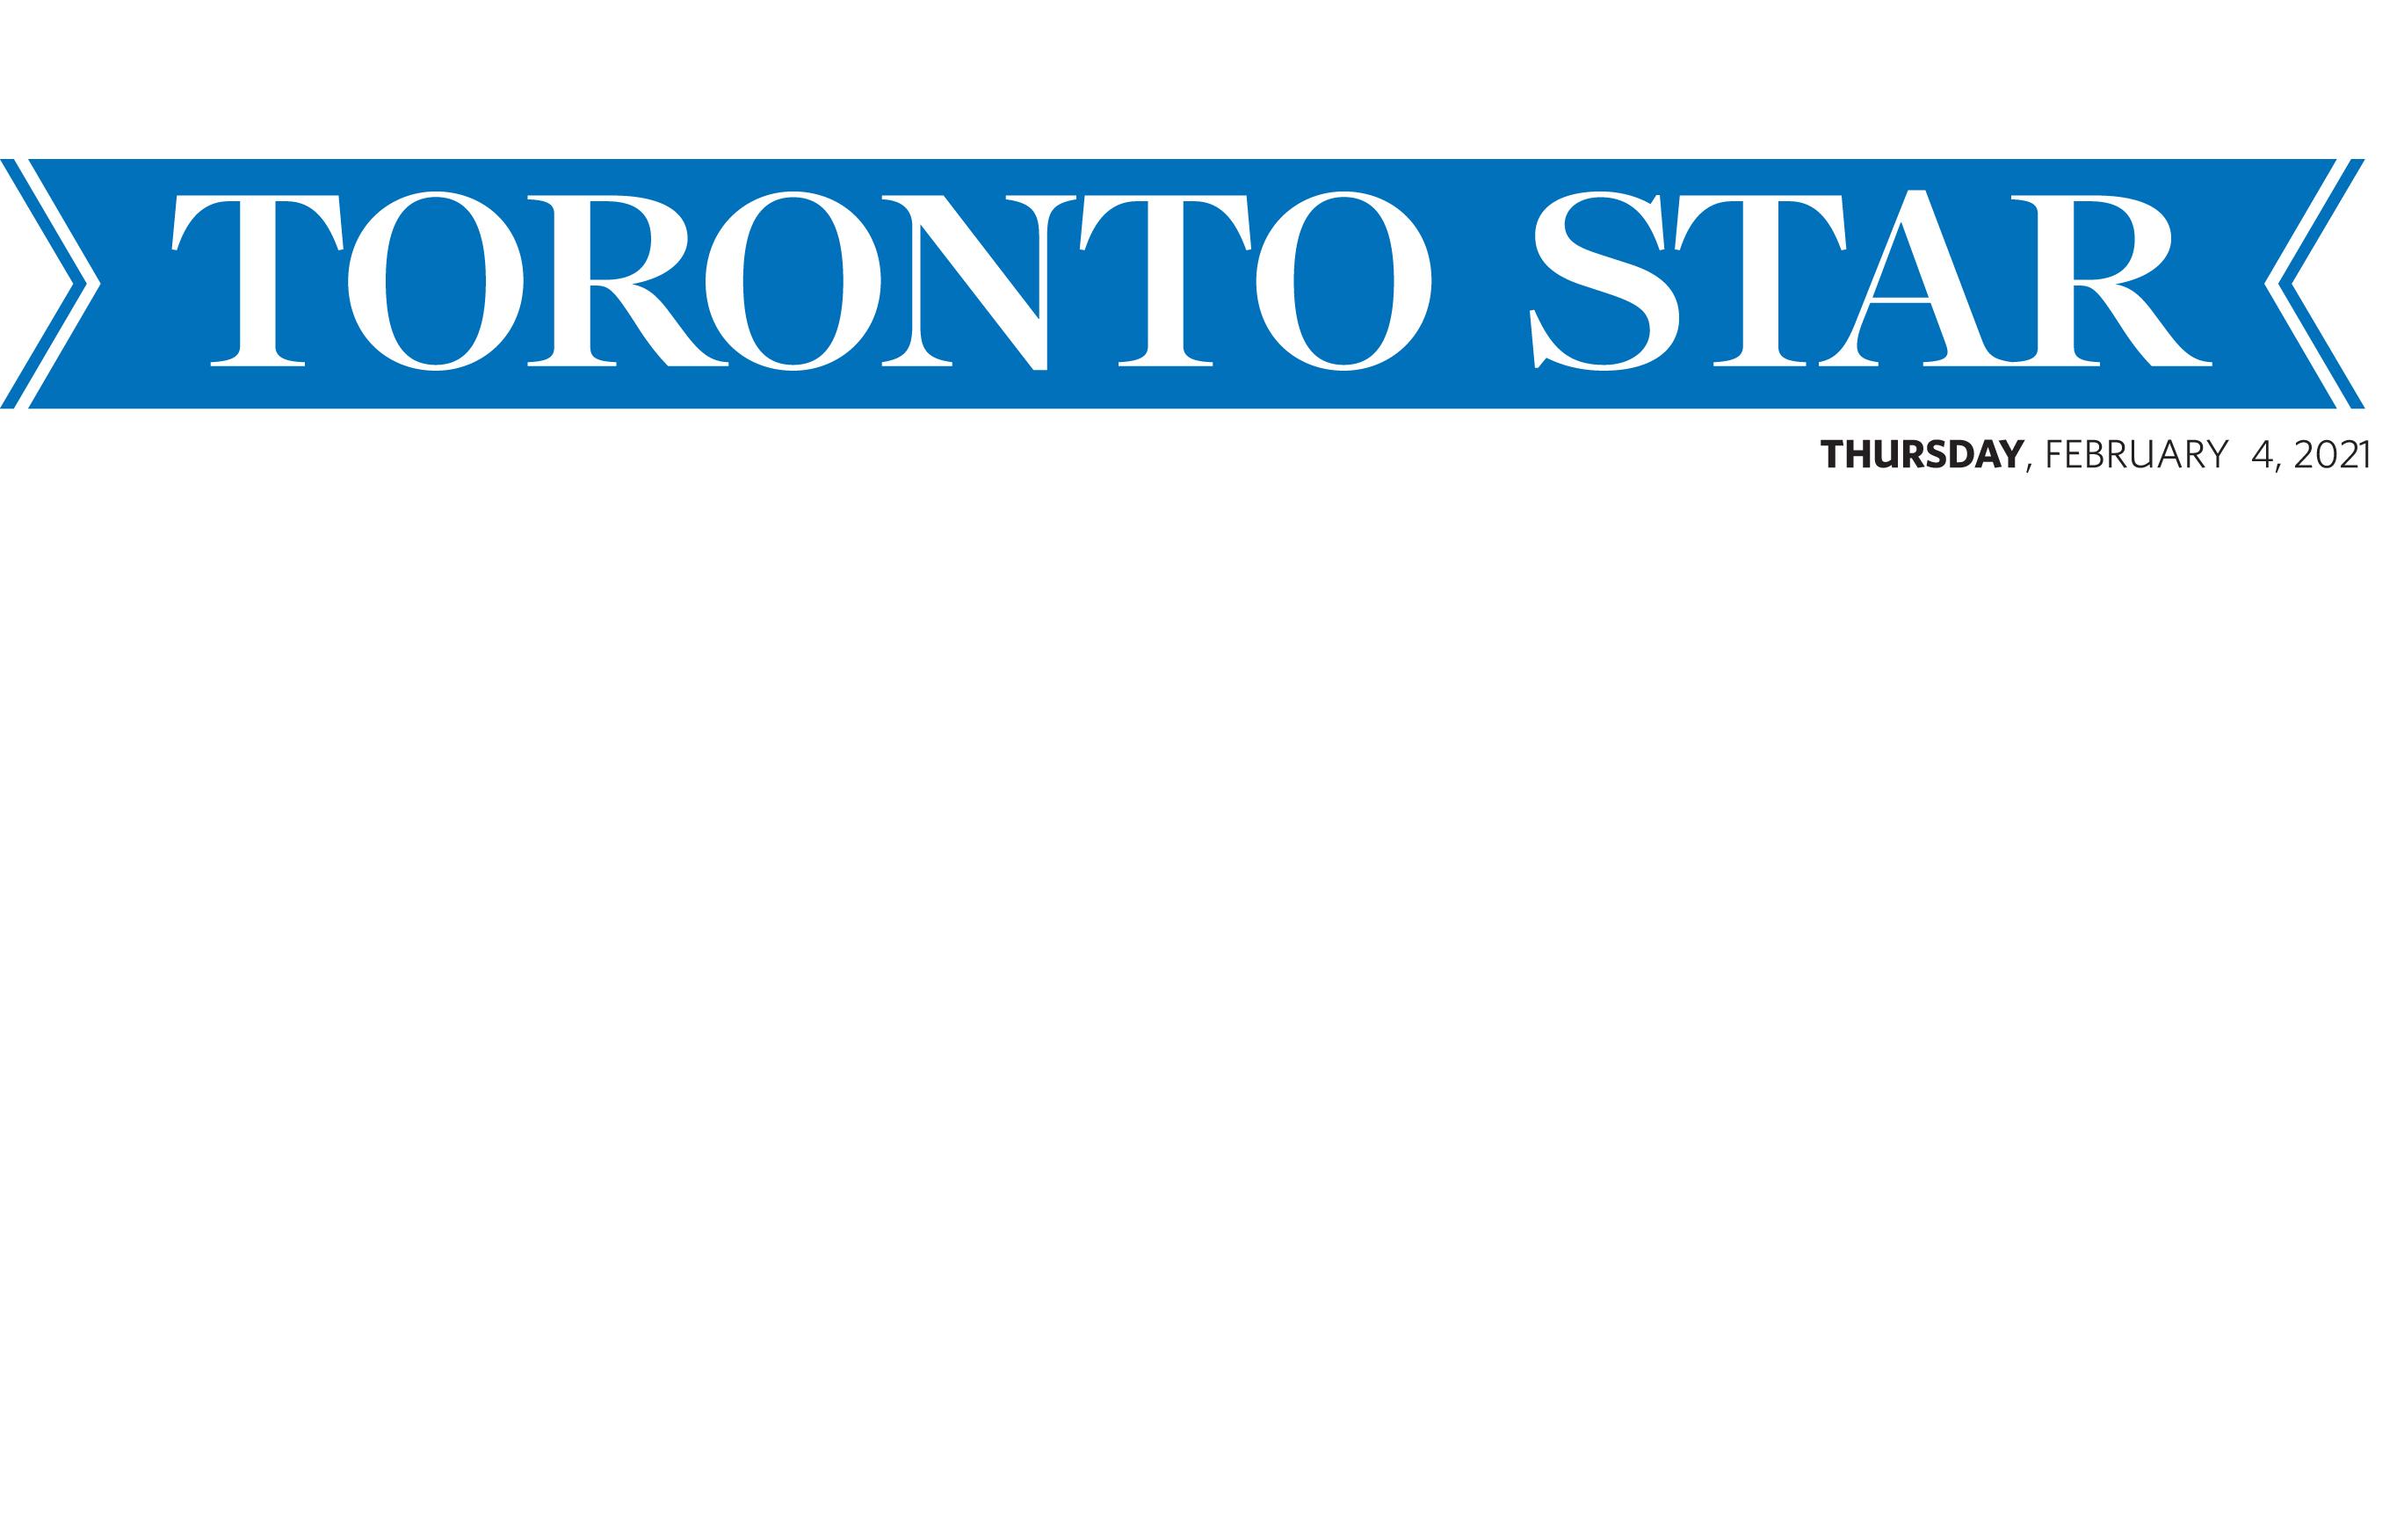 The_Star#Toronto_Star#02-04-2021#ON#ON0#SS01#1#rjones@metronews.